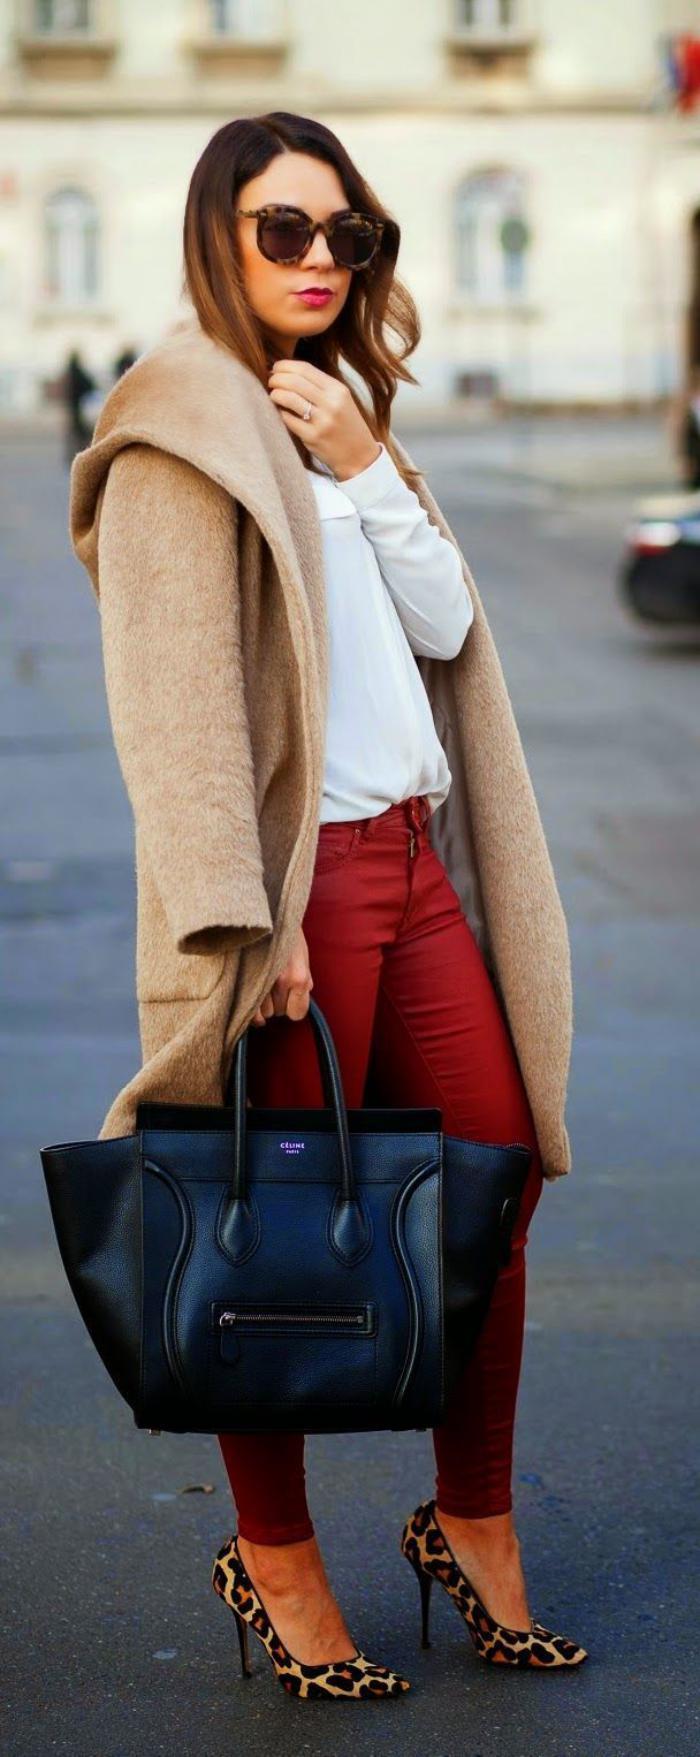 winterjacke-damen-Karamell-Farbe-rote-Hosen-Schuhe-mit-Tier-Muster